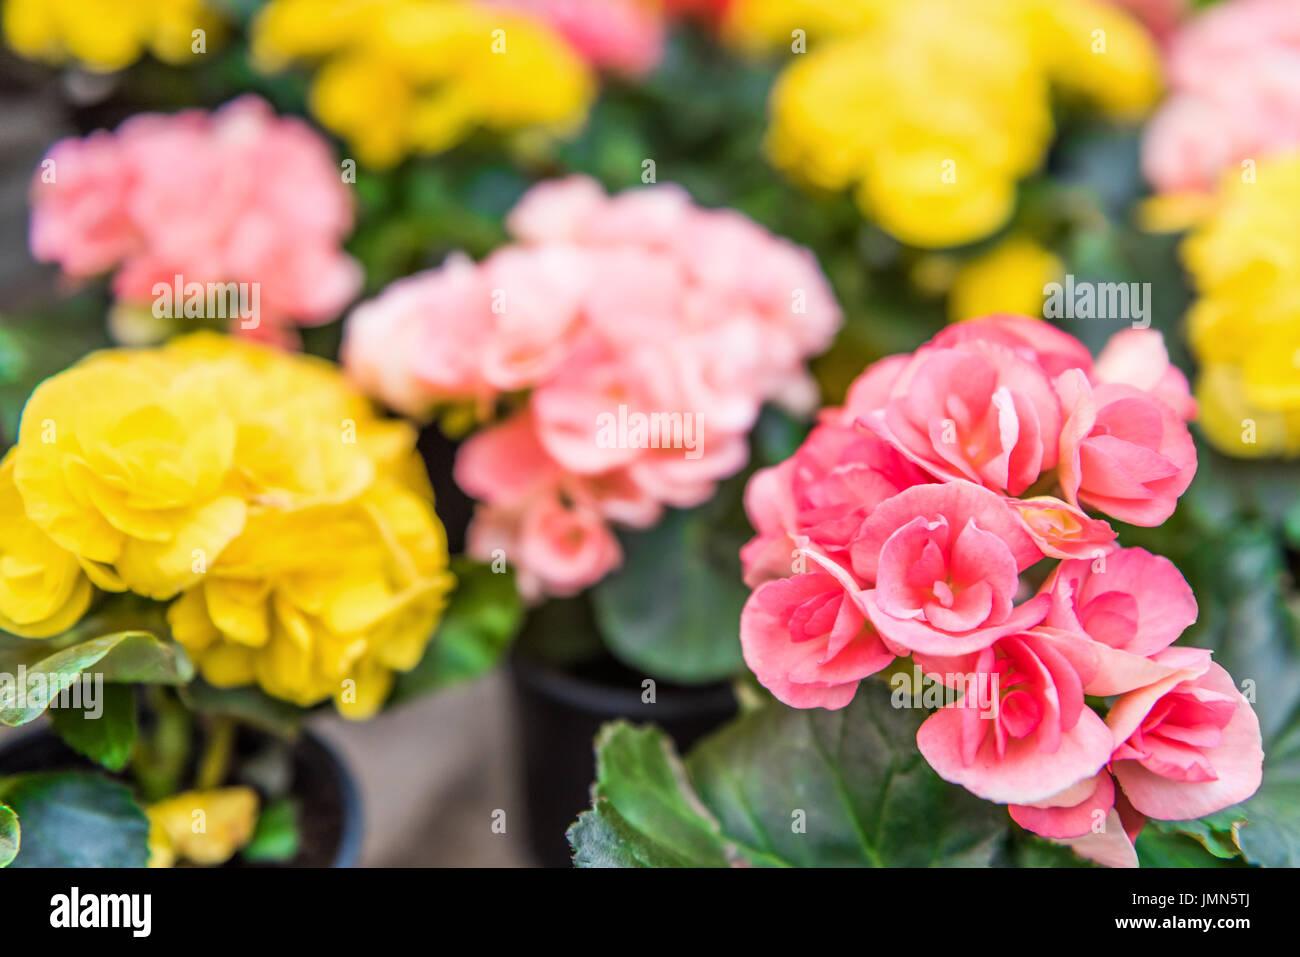 Hiemalis Begonia Yellow And Pink Flowers Macro Closeup Stock Photo